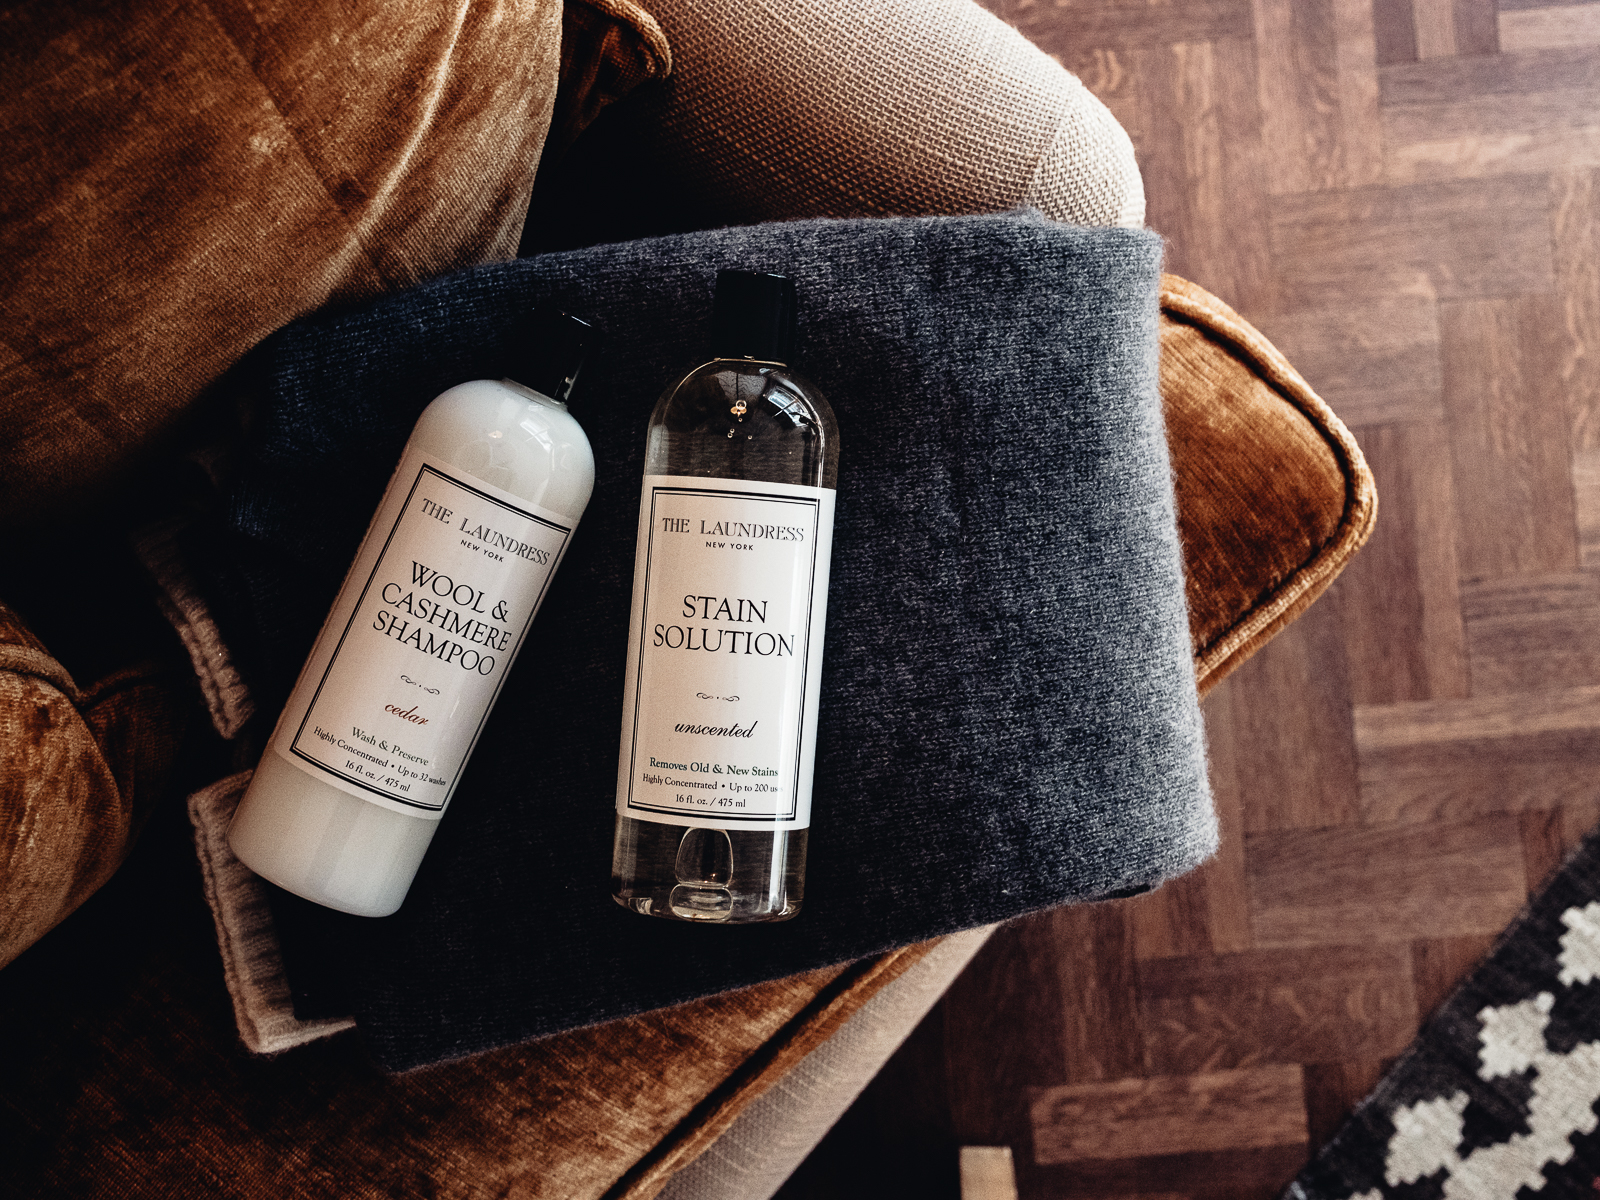 THE LAUNDRESS LA wool & cashmere 4 steps Set - 10-10 HOPE 生活誌 - Olympus EM1Markii2512 - Yes! Please Enjoy by Fanning Tseng-4.jpg